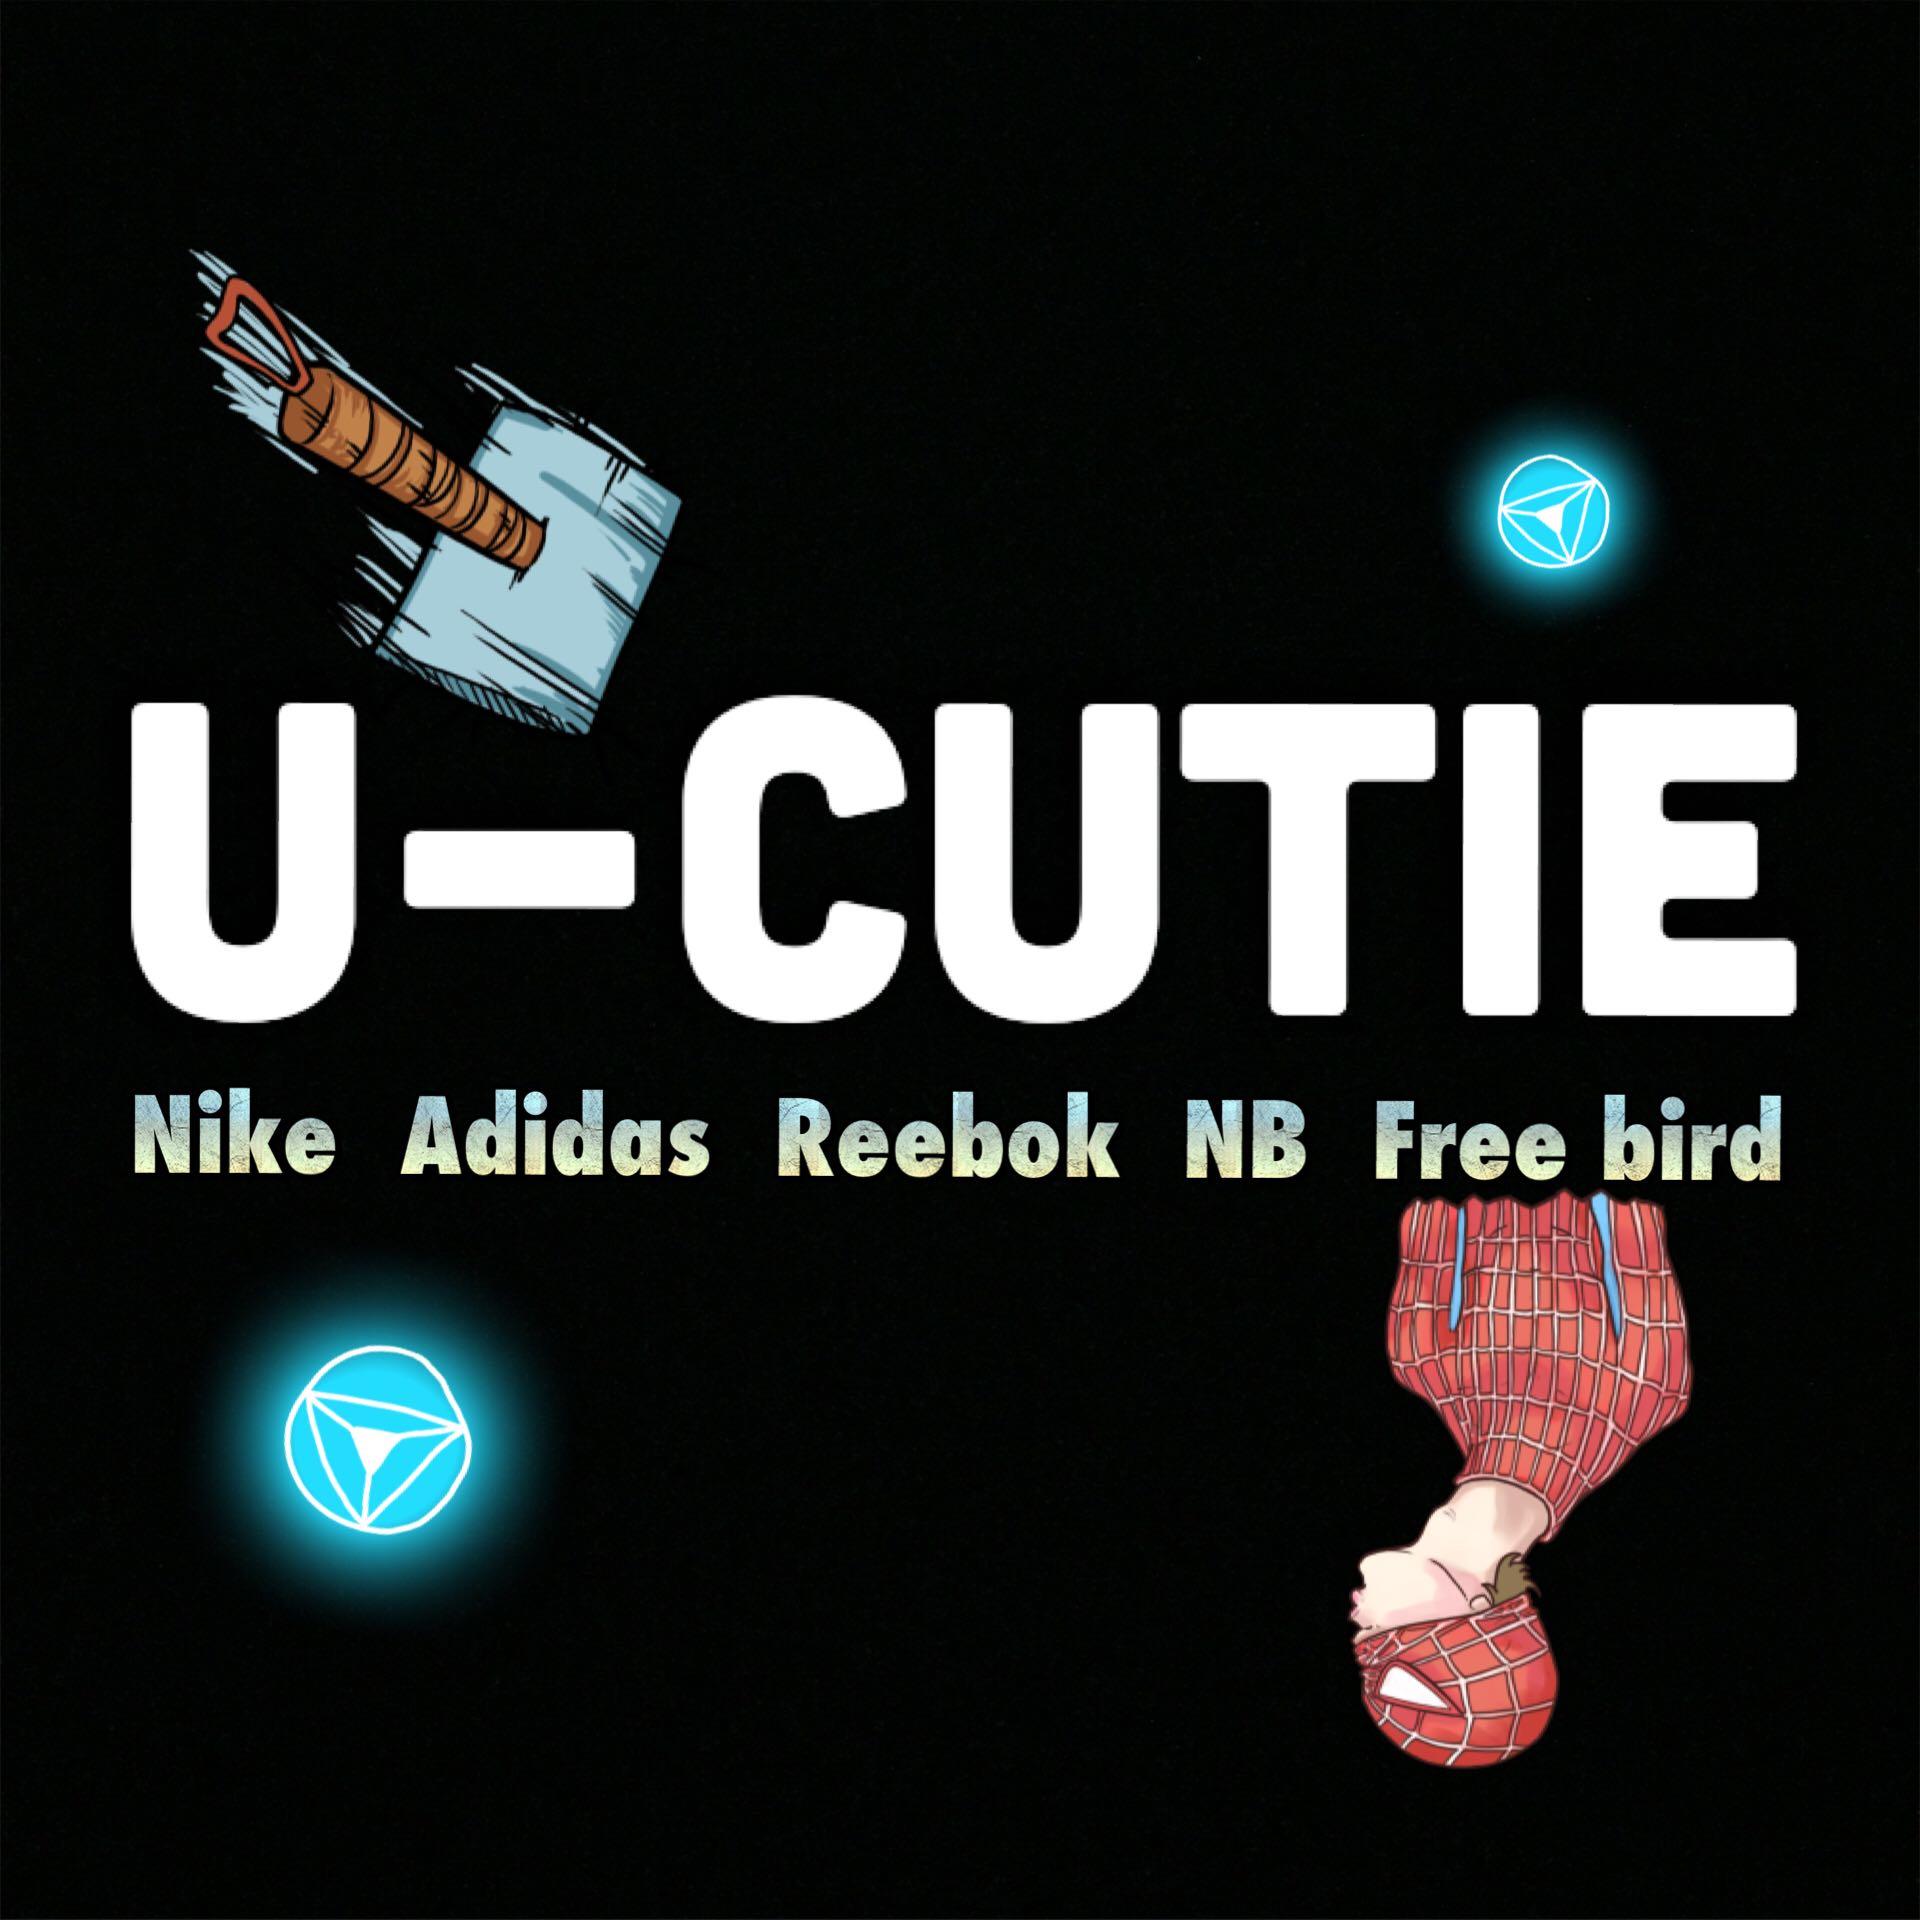 u_cutie